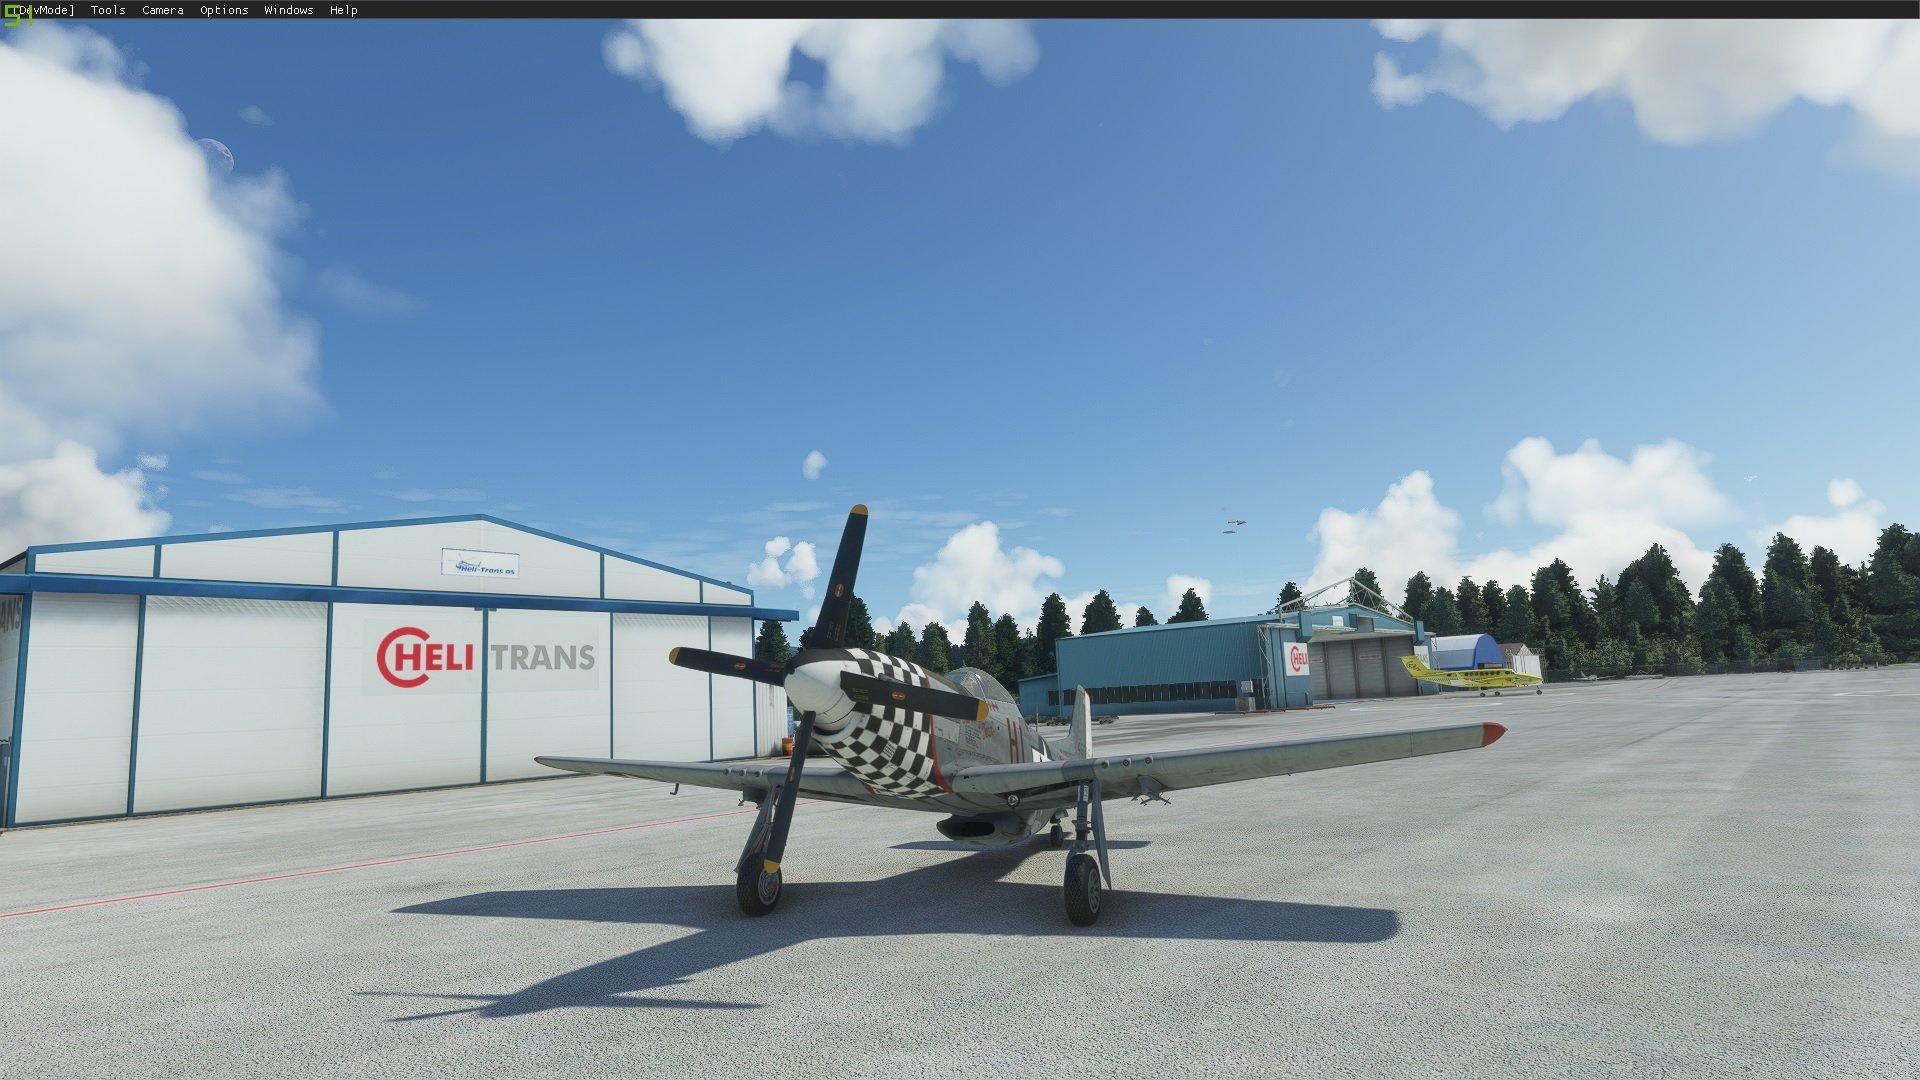 P-51D_Vernes.jpg.8d504b7865381b81207cd13326646d64.jpg